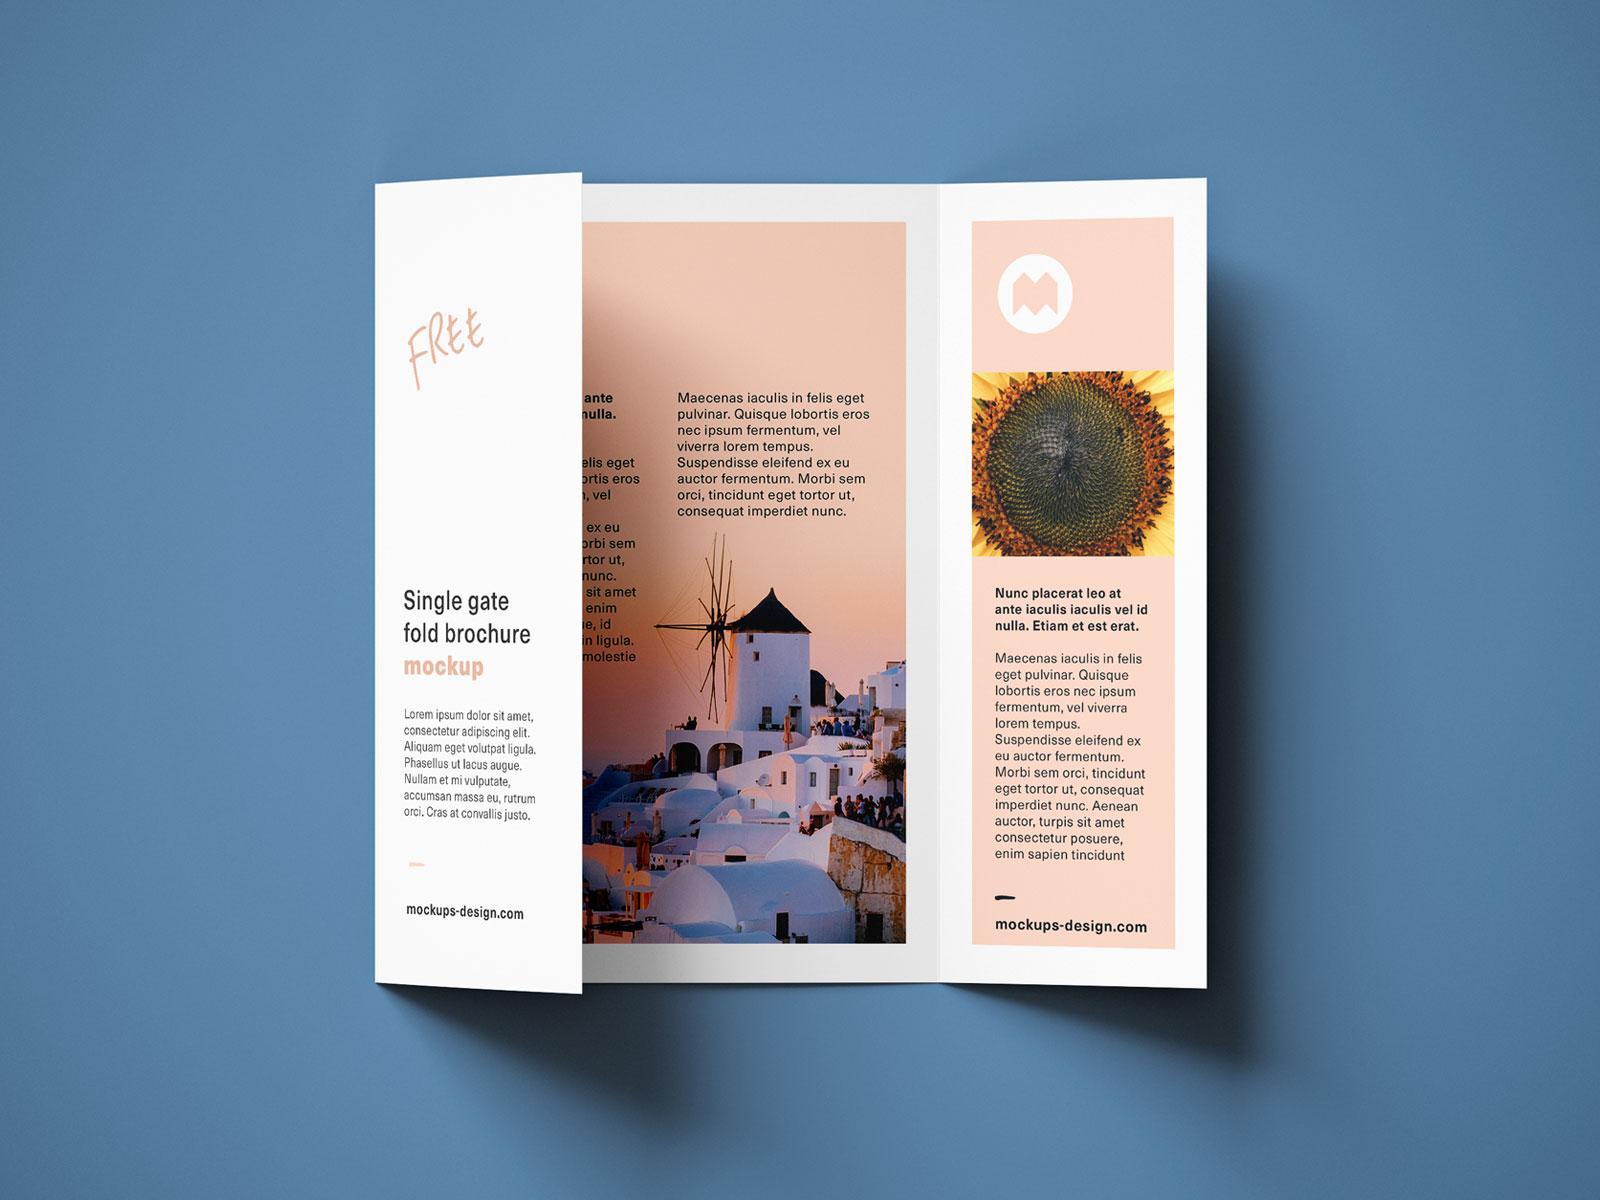 Free-Single-Gate-Fold-Brochure-Mockup-PSD-Set-6